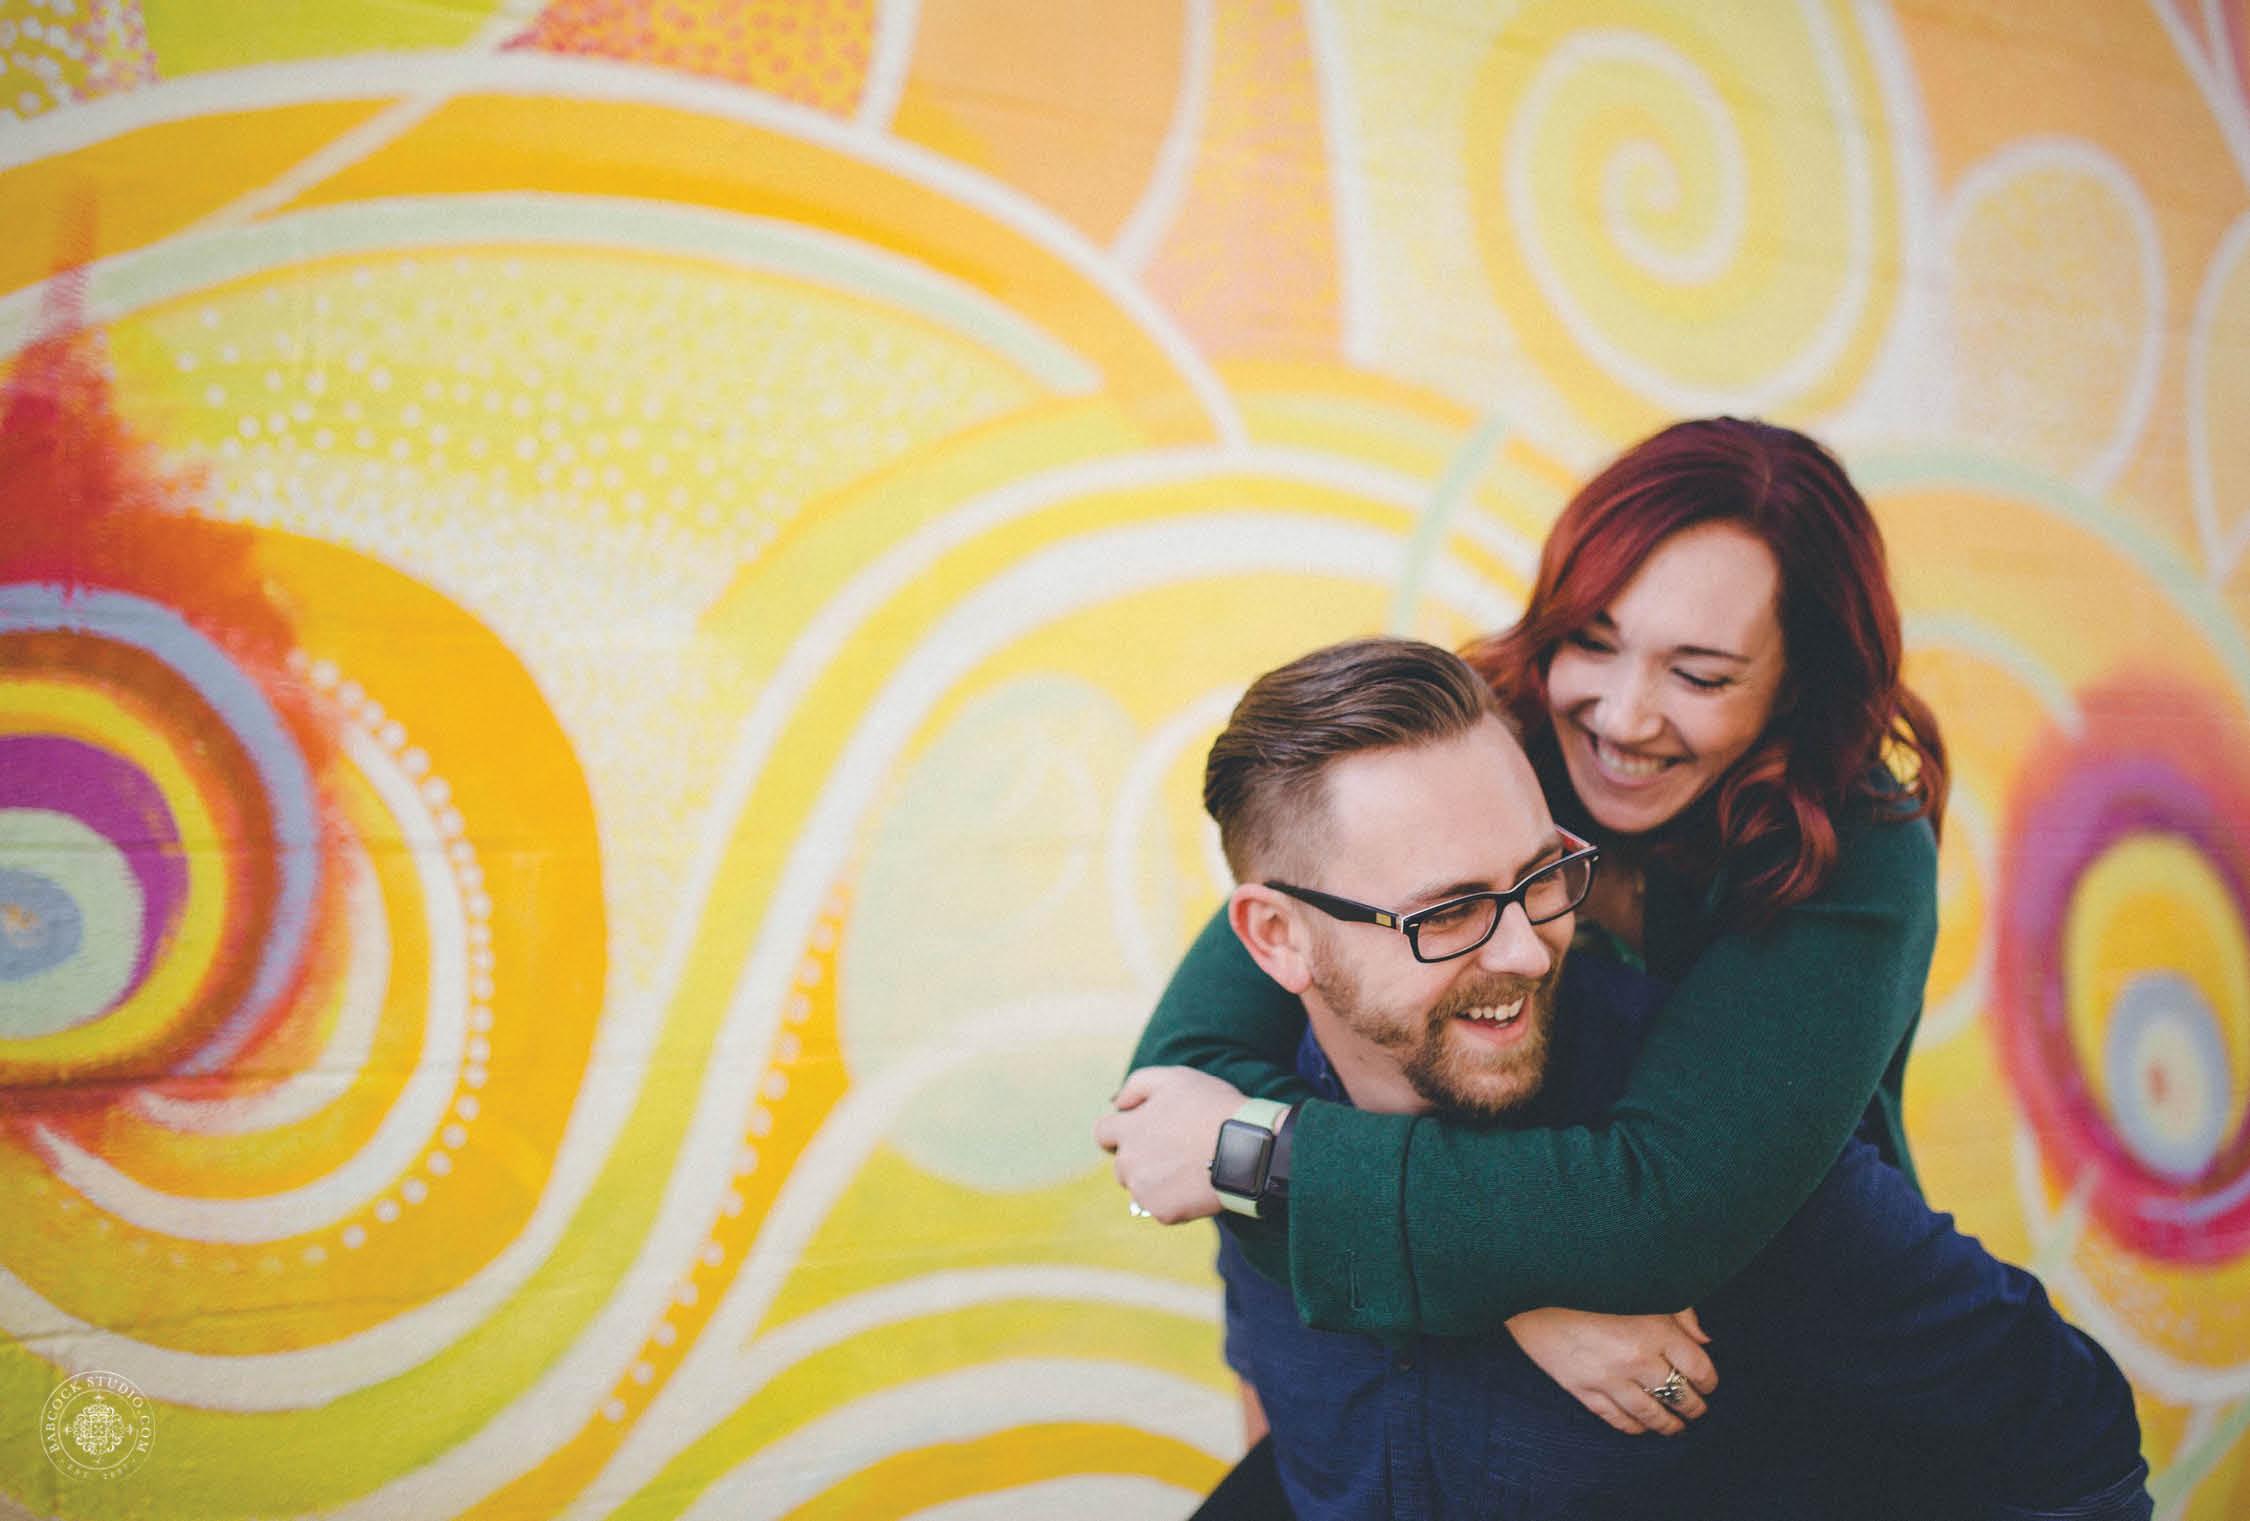 taylor-josh-engagement-photographer-dayton-ohio-3.jpg